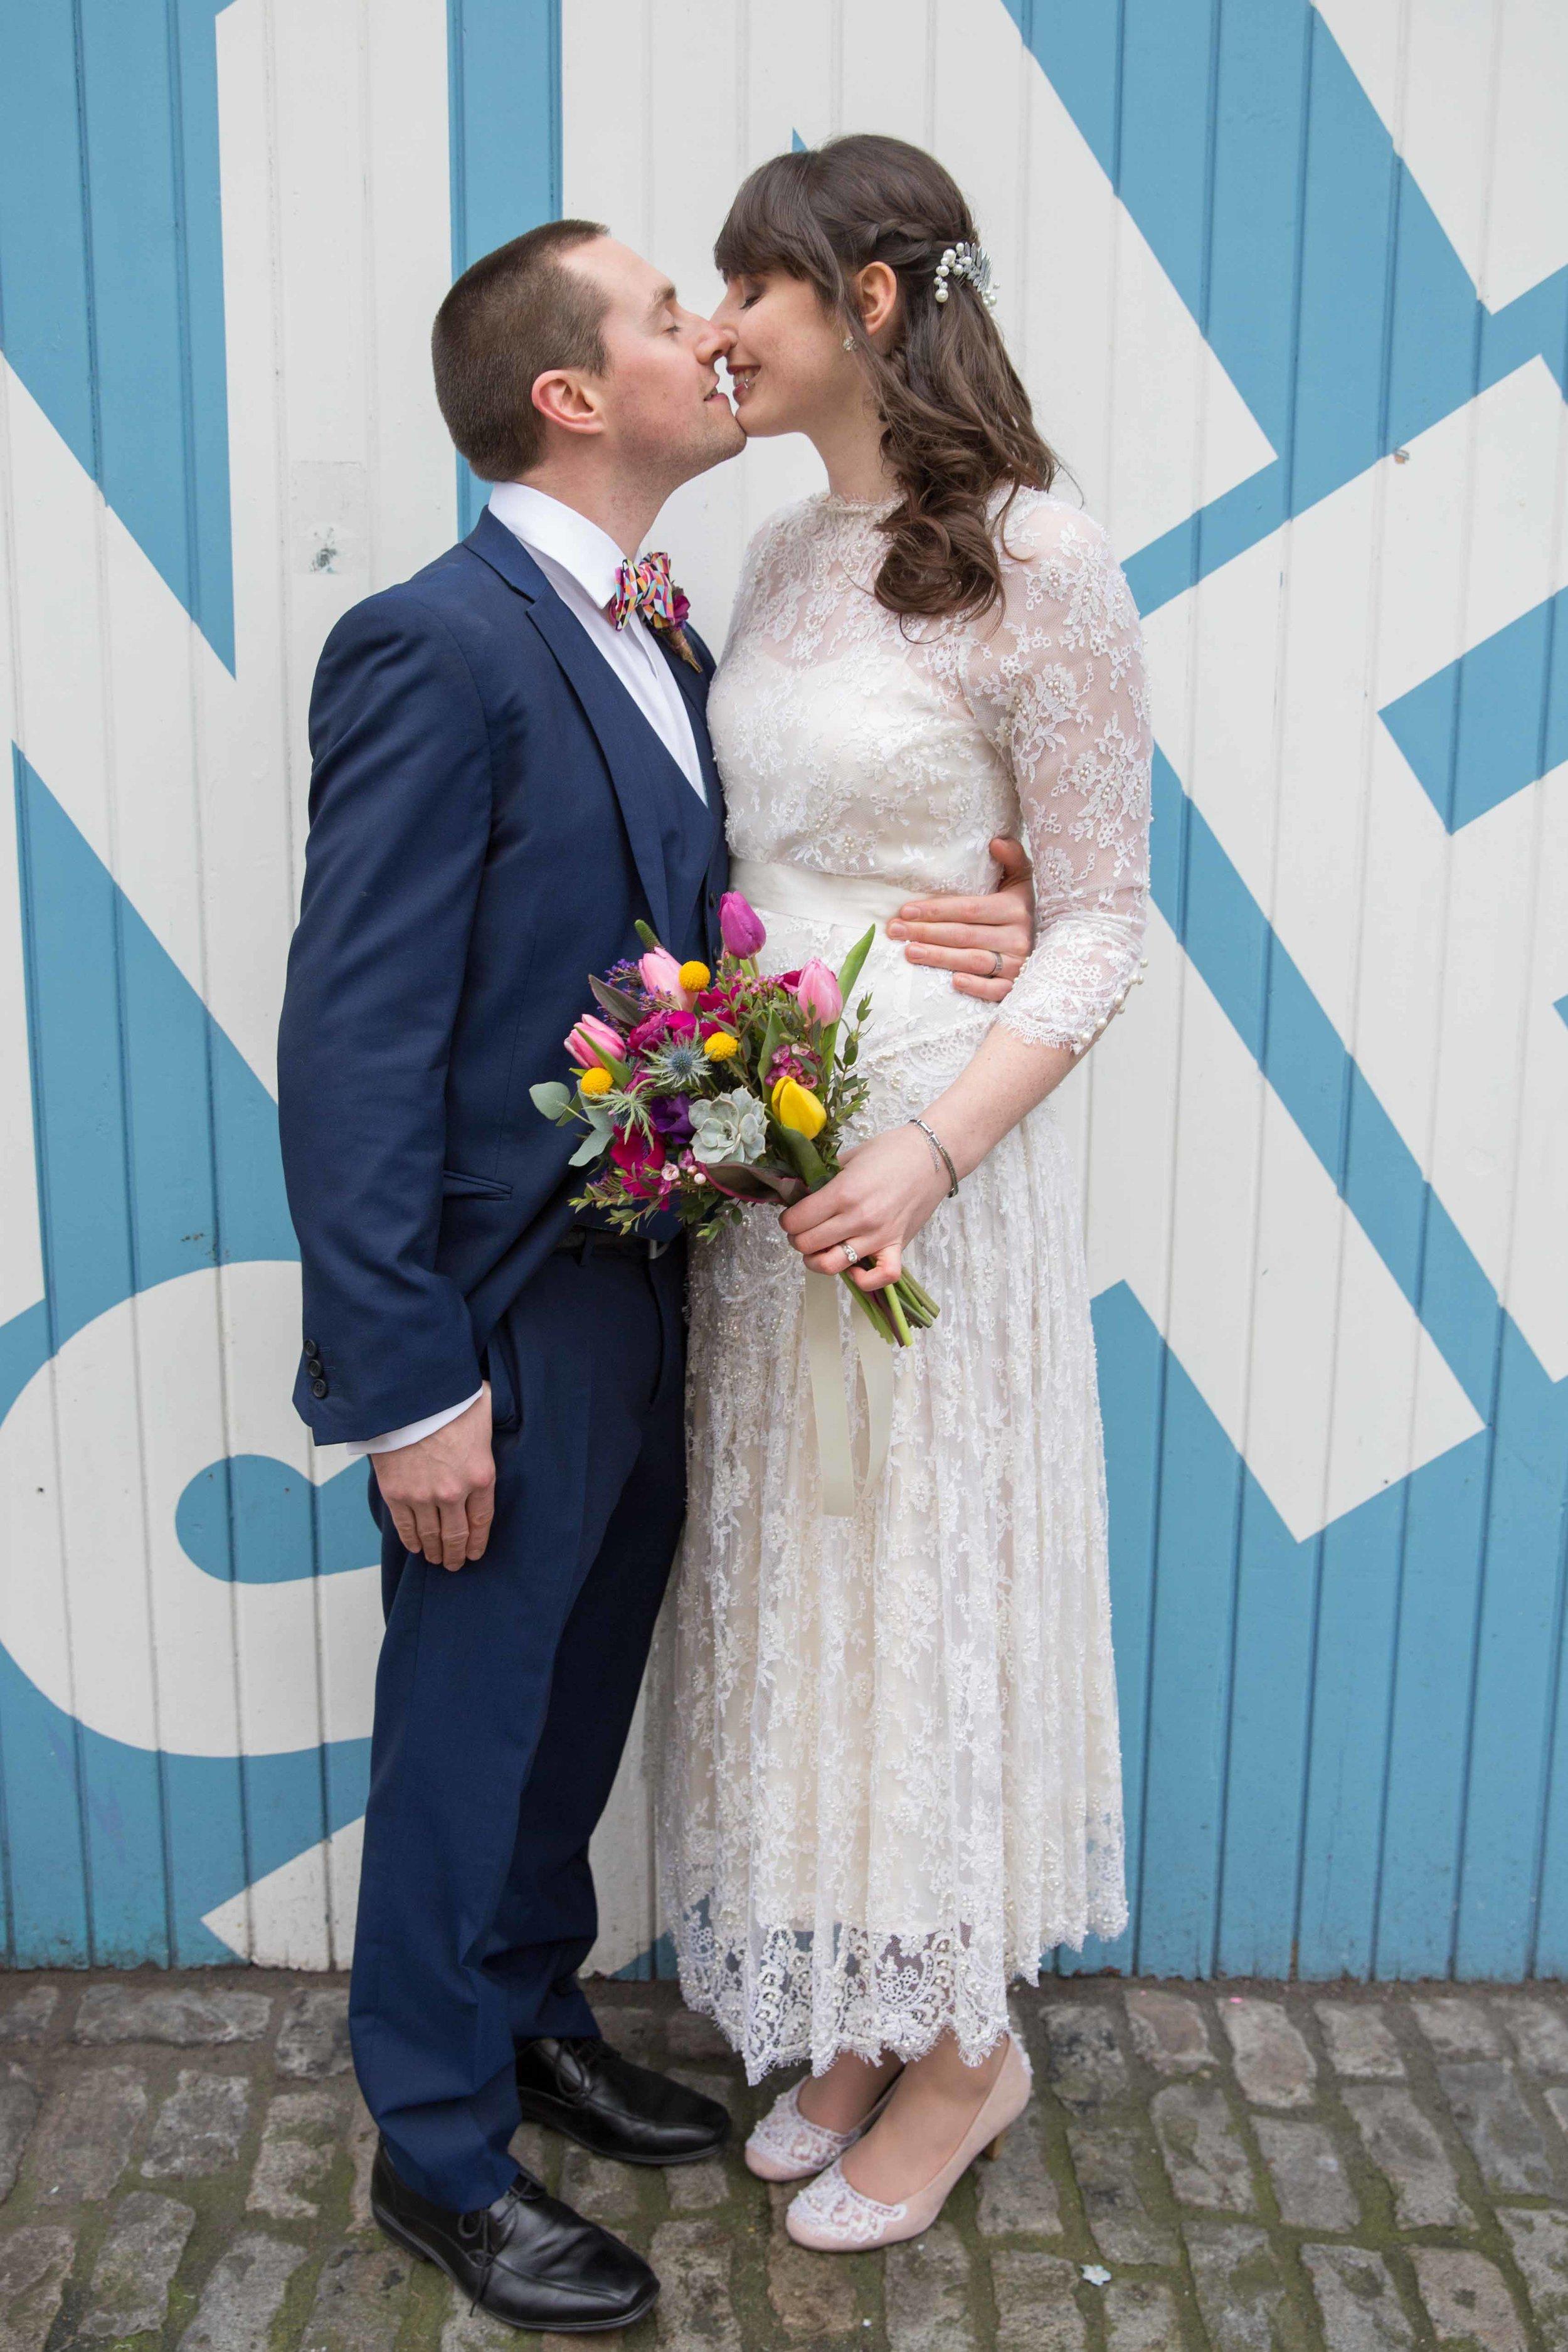 Adam & Faye - Wright Wedding Photography - Bristol Wedding Photographer -251.jpg